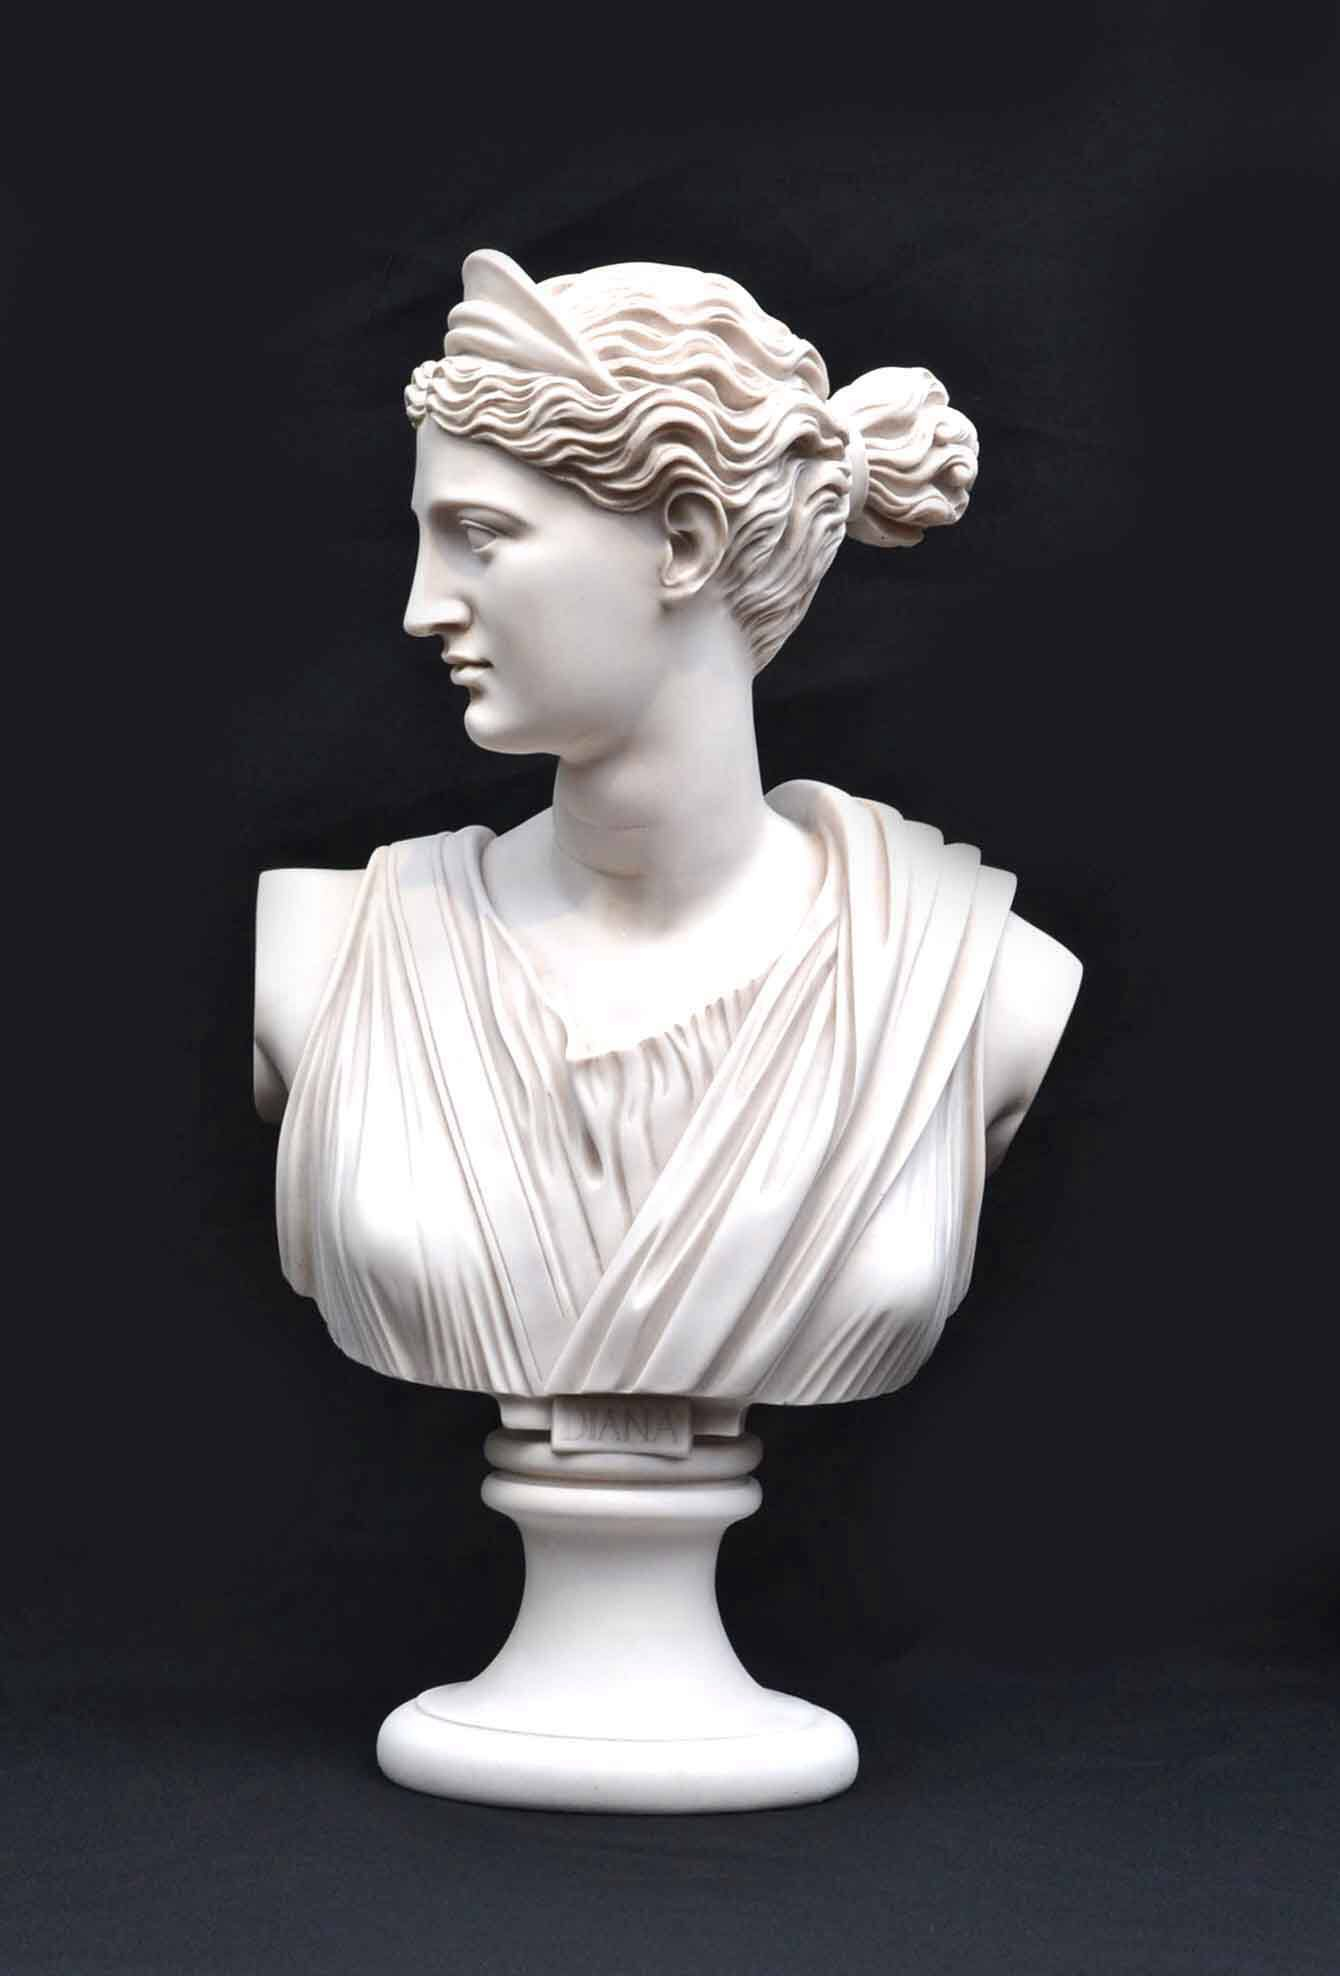 Stunning Marble Bust Of Diana 1 Jpg Marble Bust Marble Sculpture Roman Sculpture